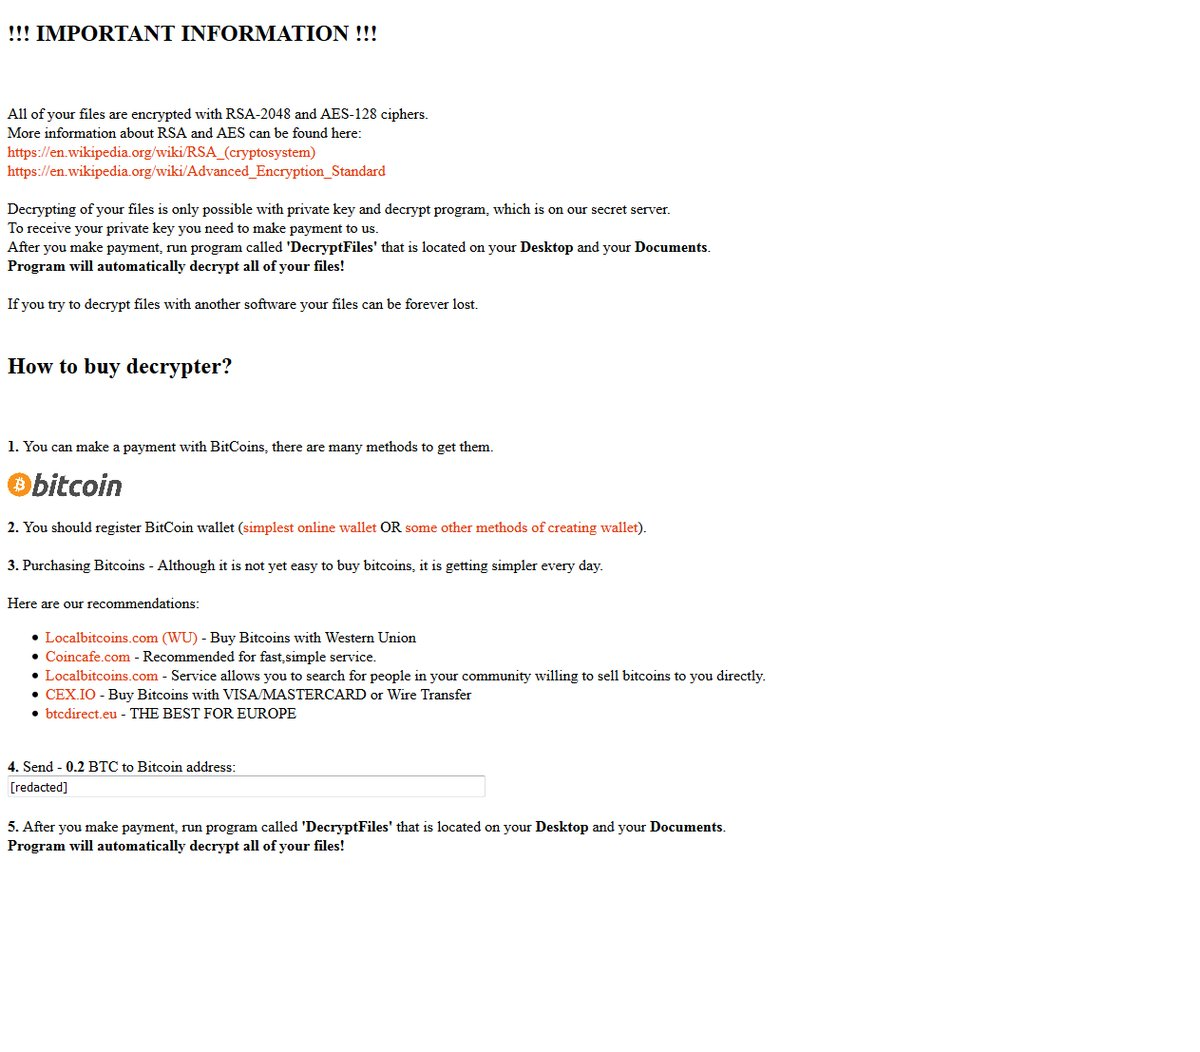 Marlboro ransomware ransom note